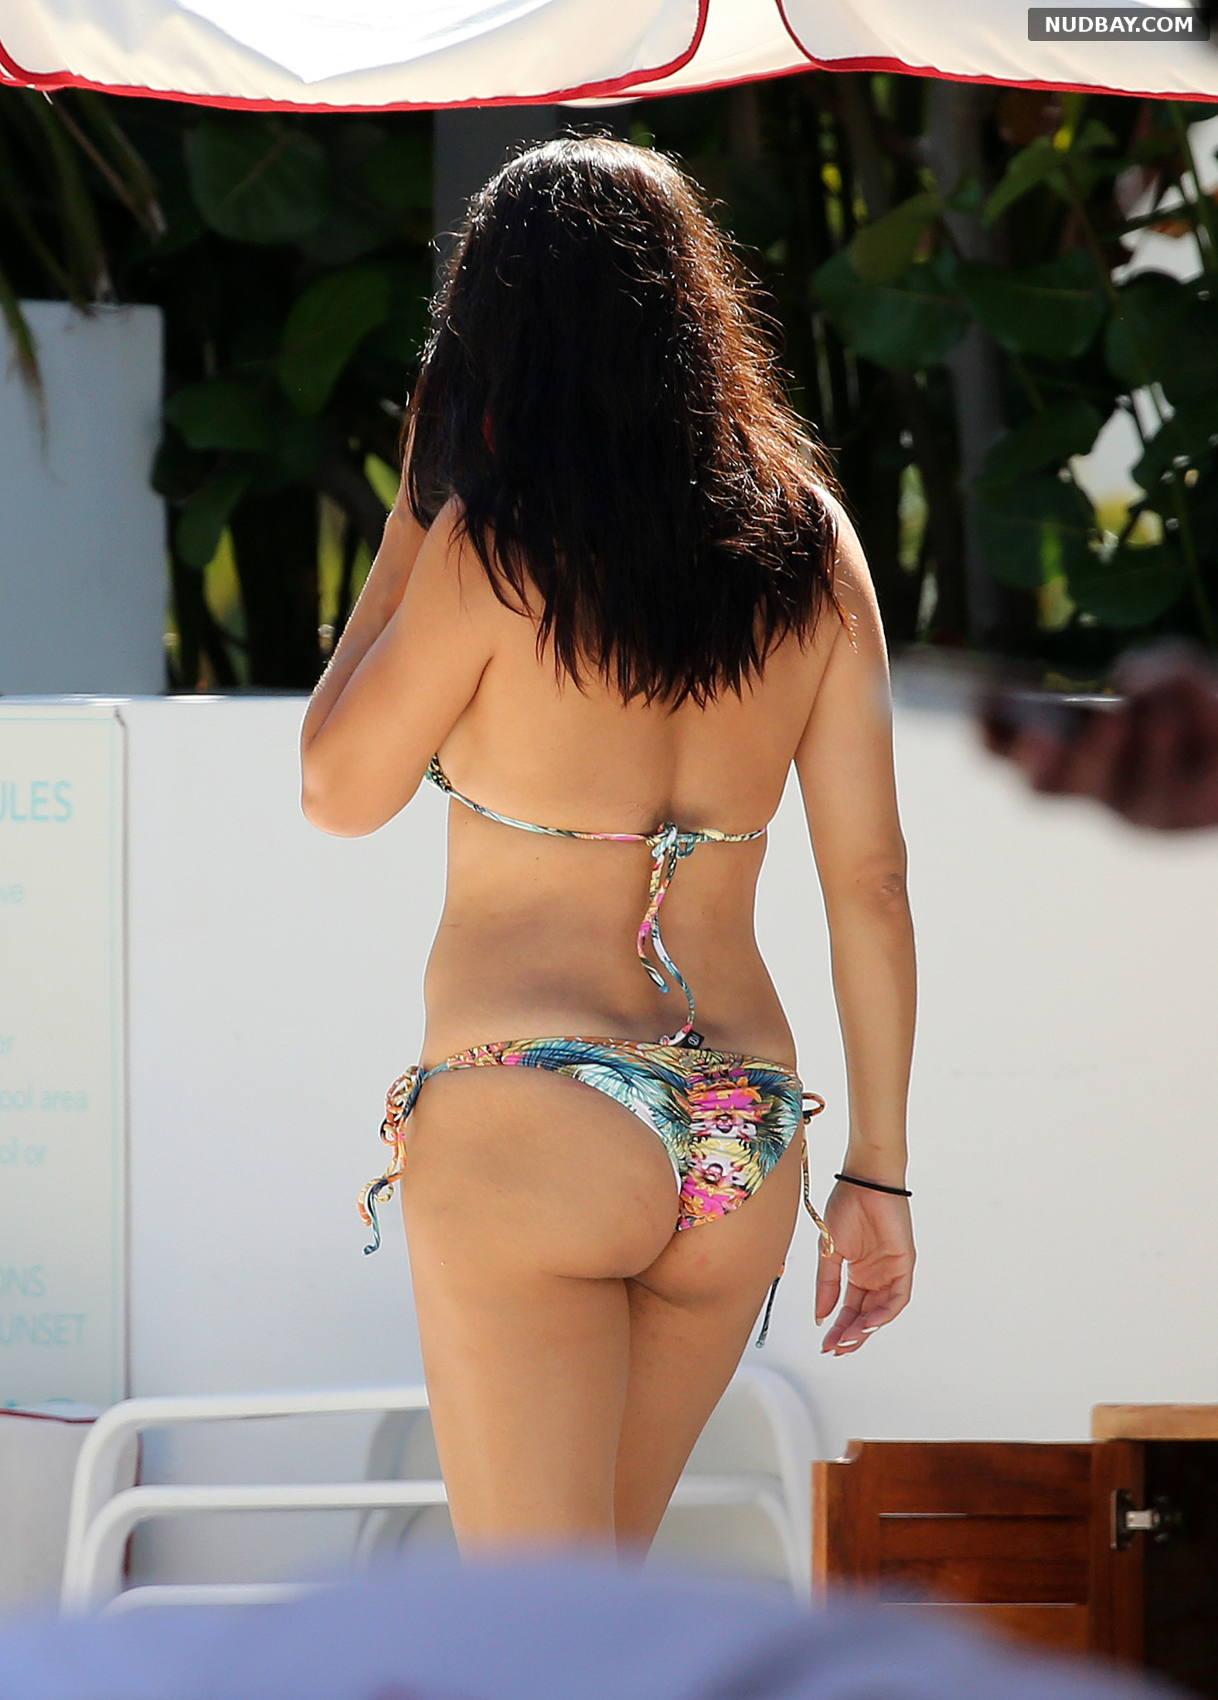 Adriana Lima in Bikini on the beach in Miami Aug 13 2019